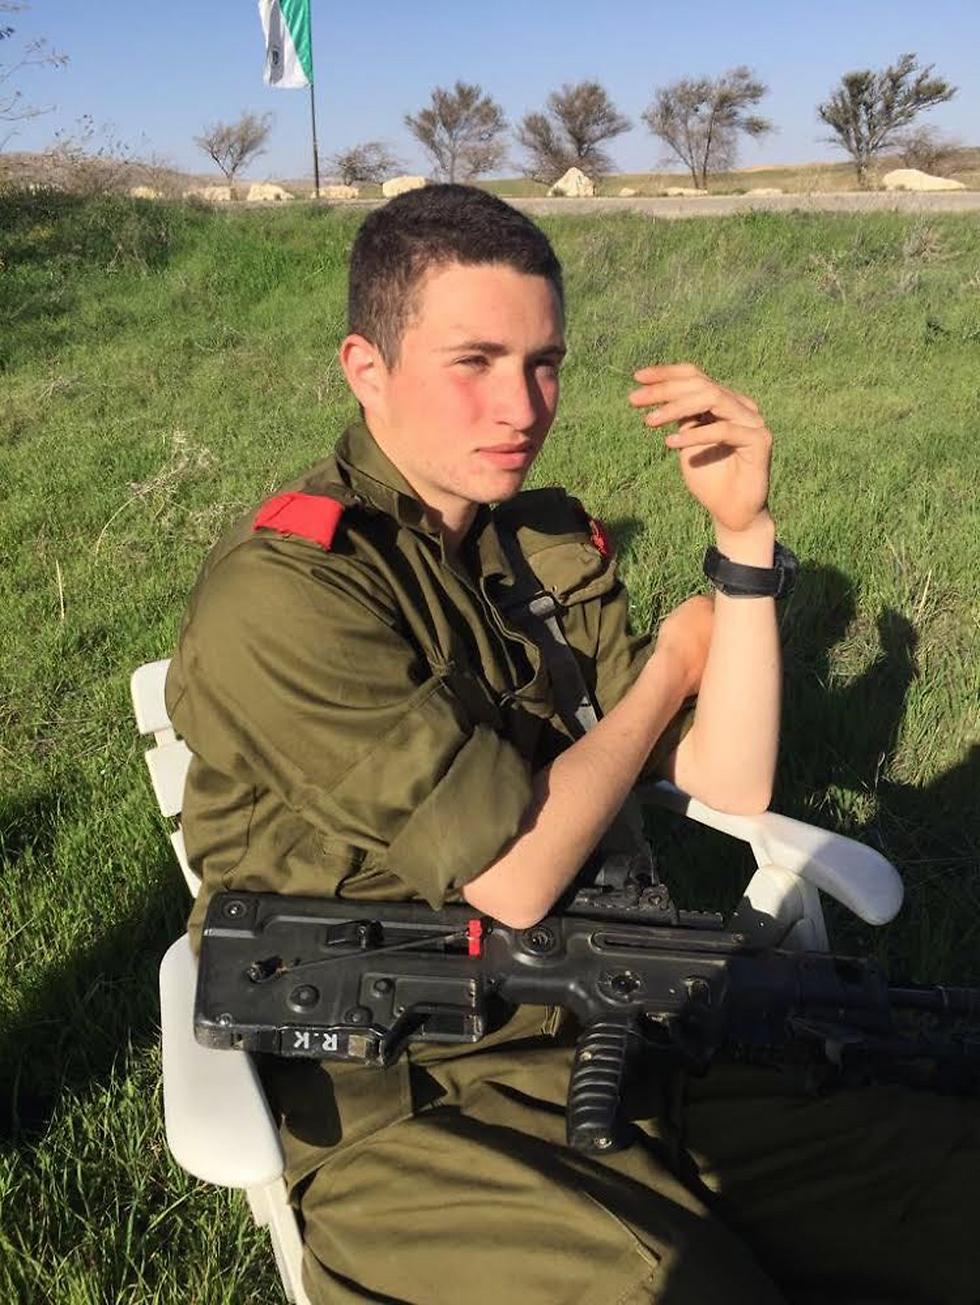 The slain soldier, Ron Yitzhak Kokia